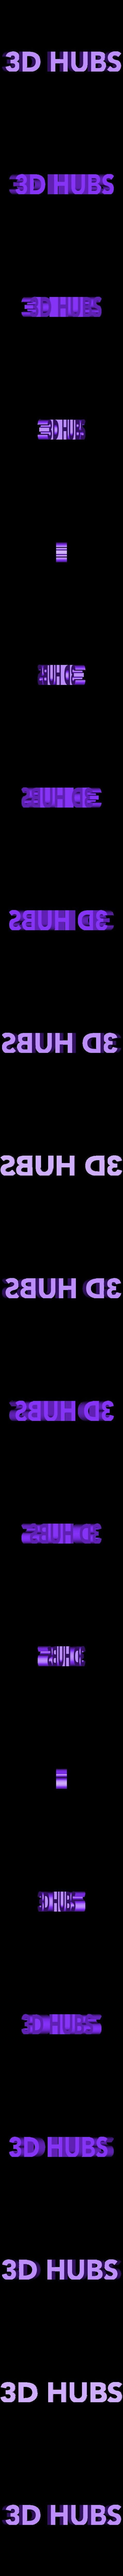 D0e5f049 284c 43e0 9aec 9a531c6baad8